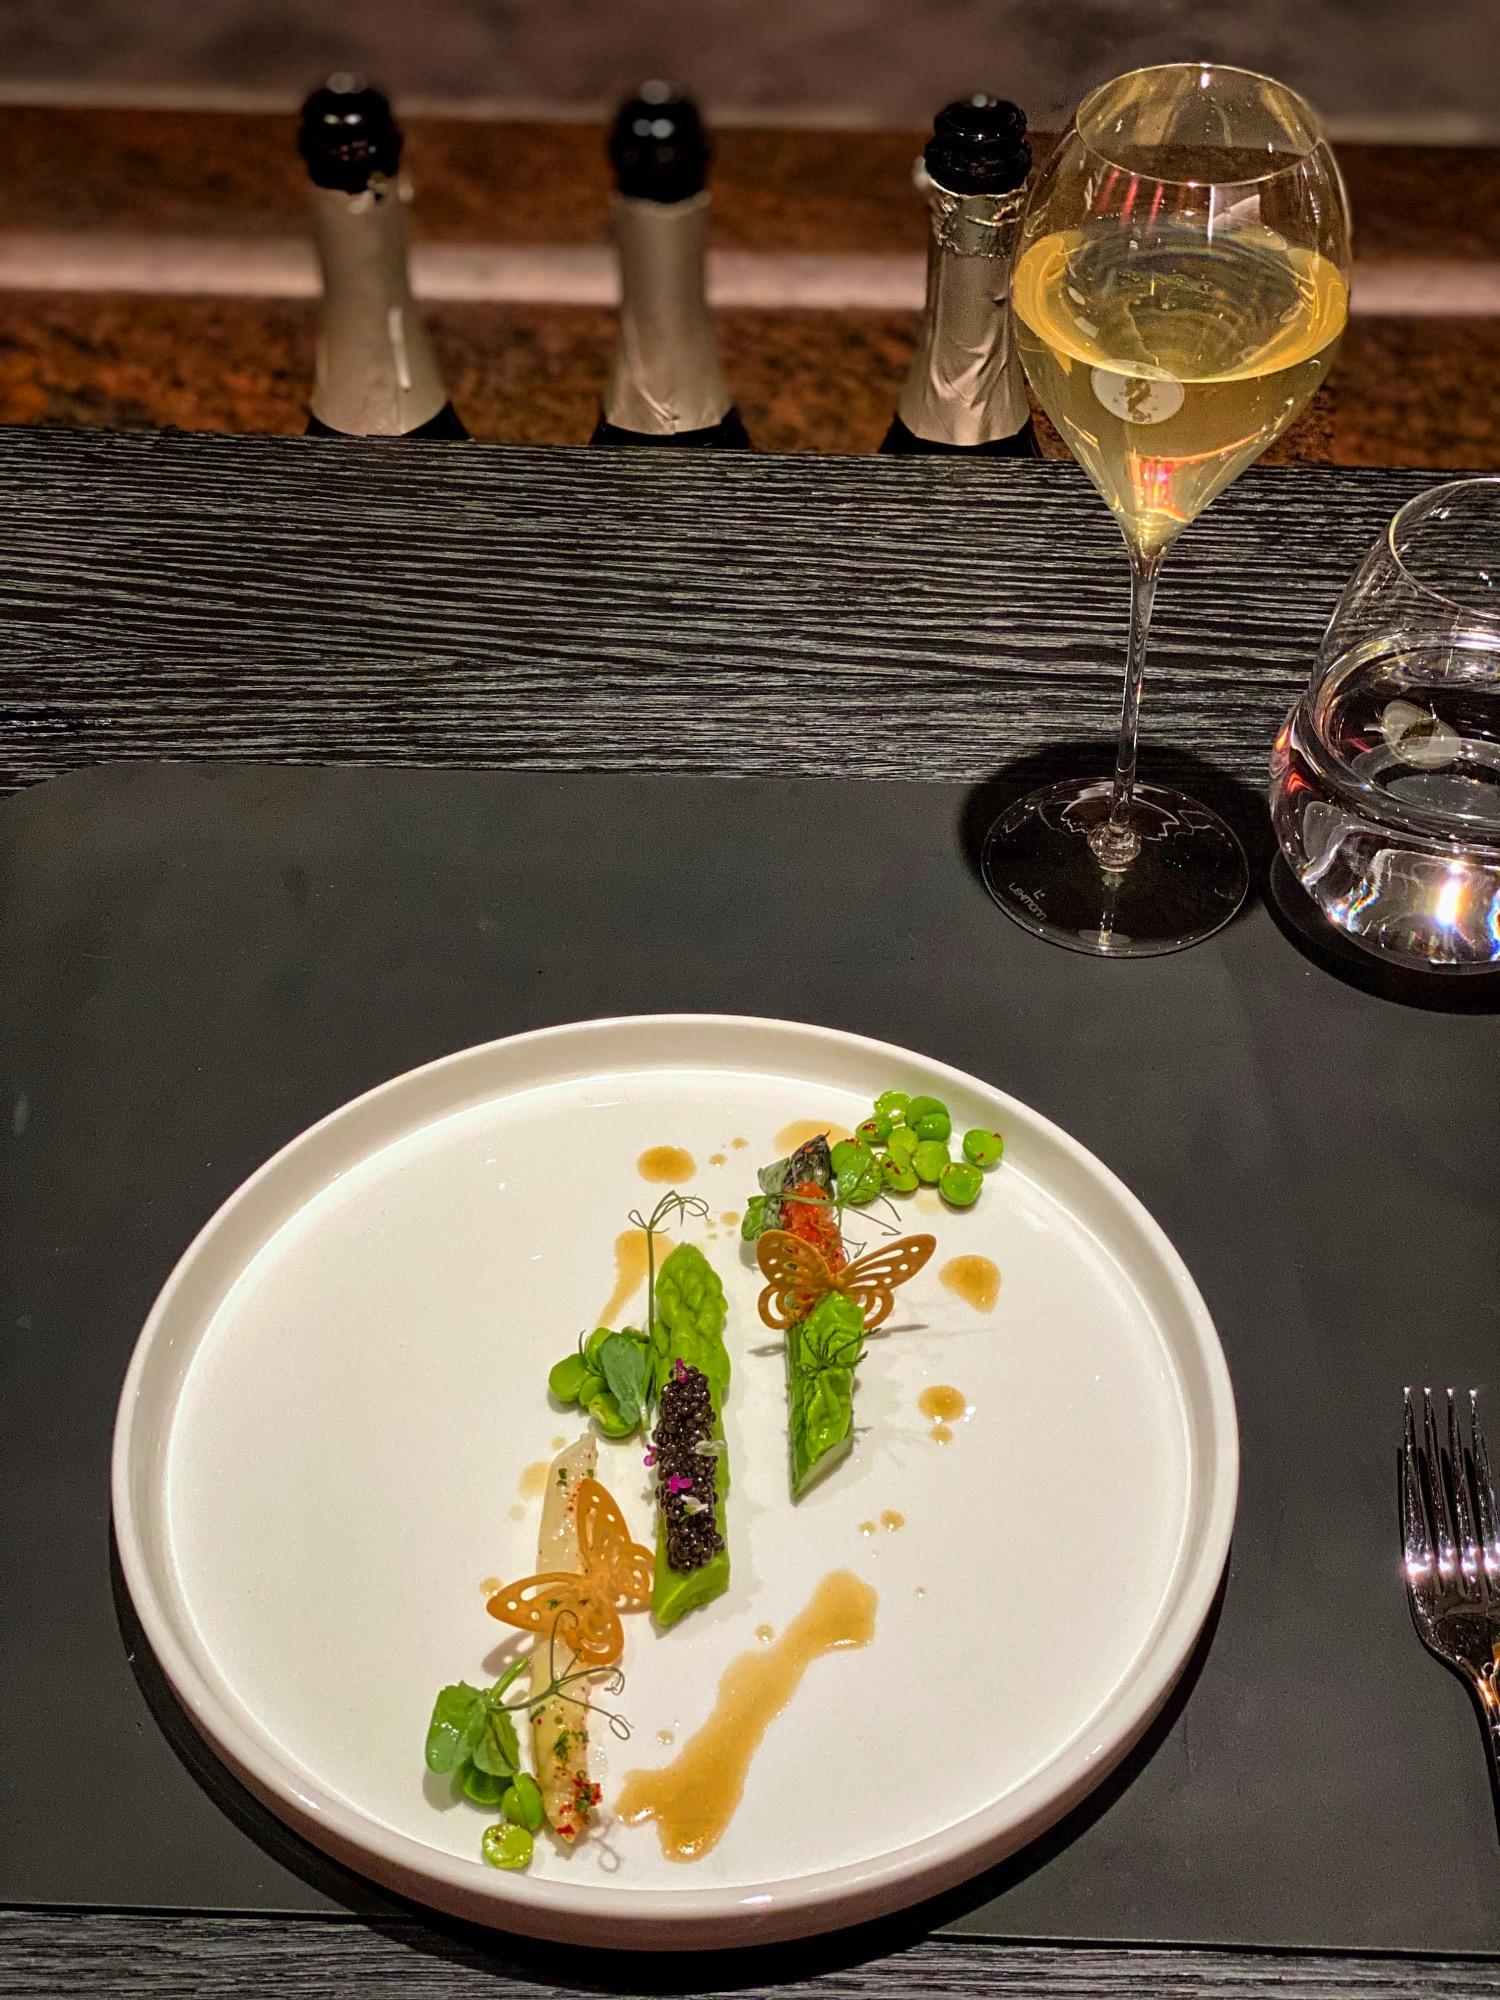 img_8520_rumour_racz_jeno_budapest_restaurant_jokuti_vilagevo_l_f.jpeg